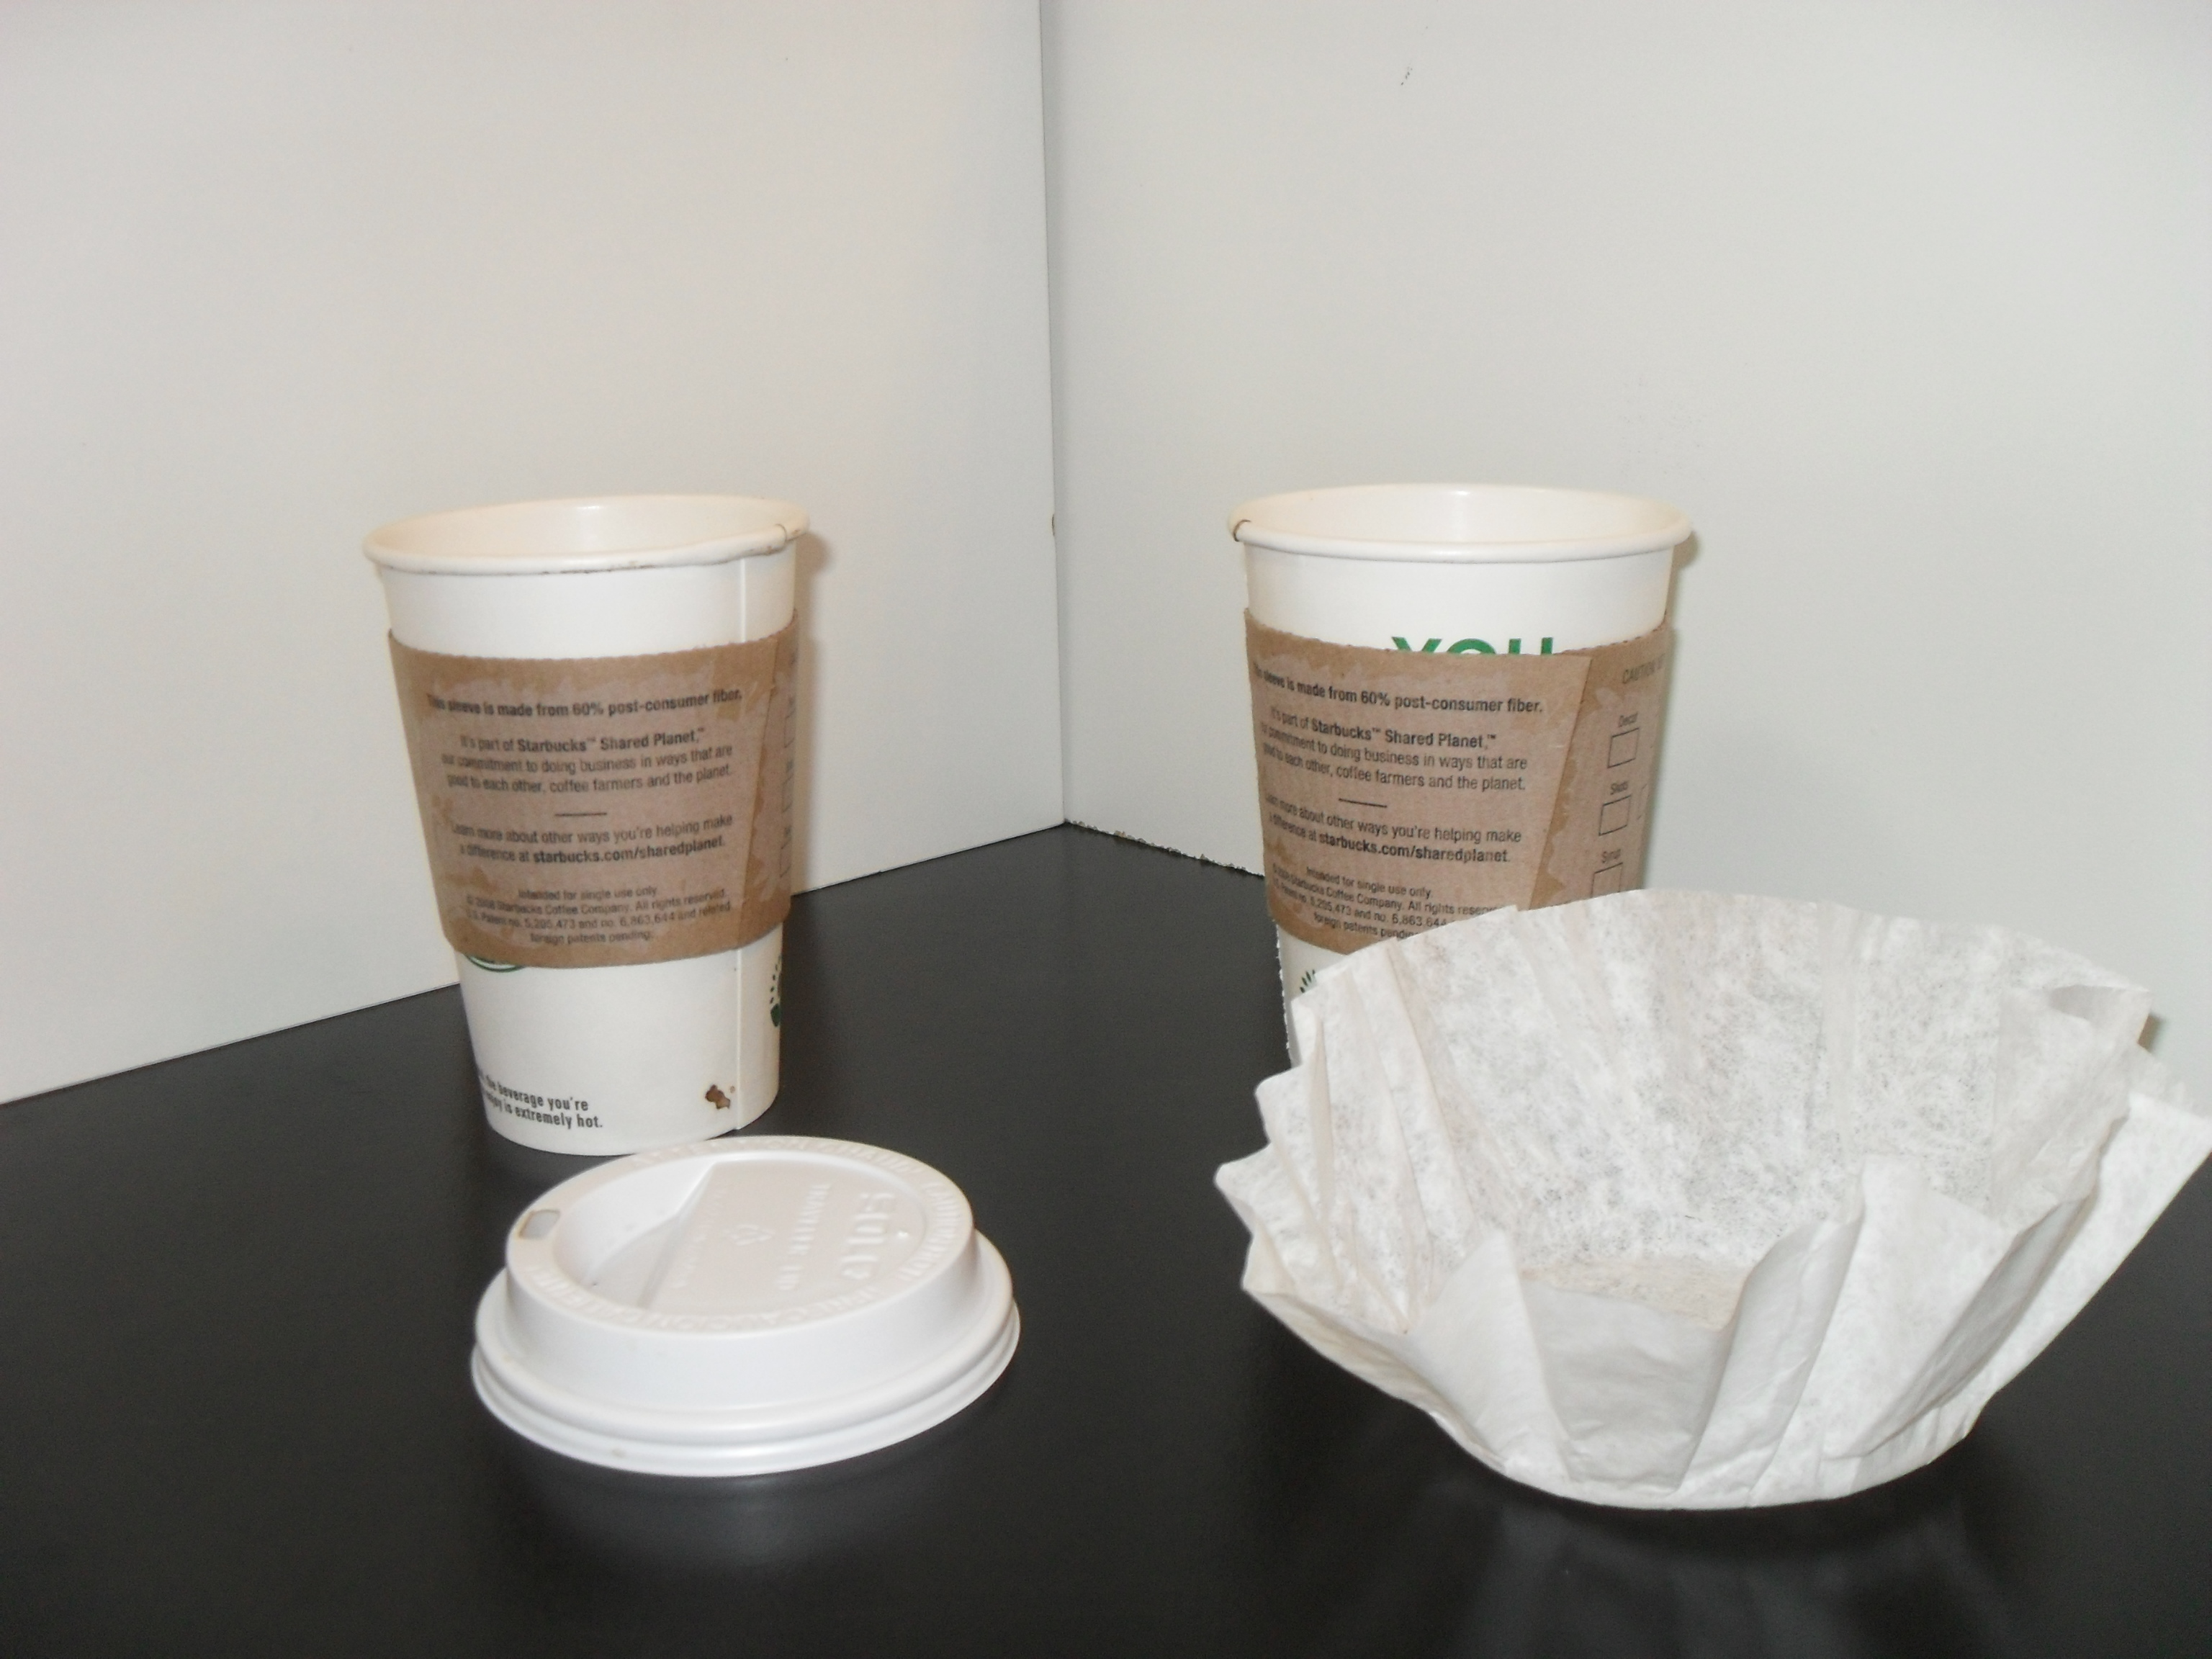 Coffee Cup Coffee Maker